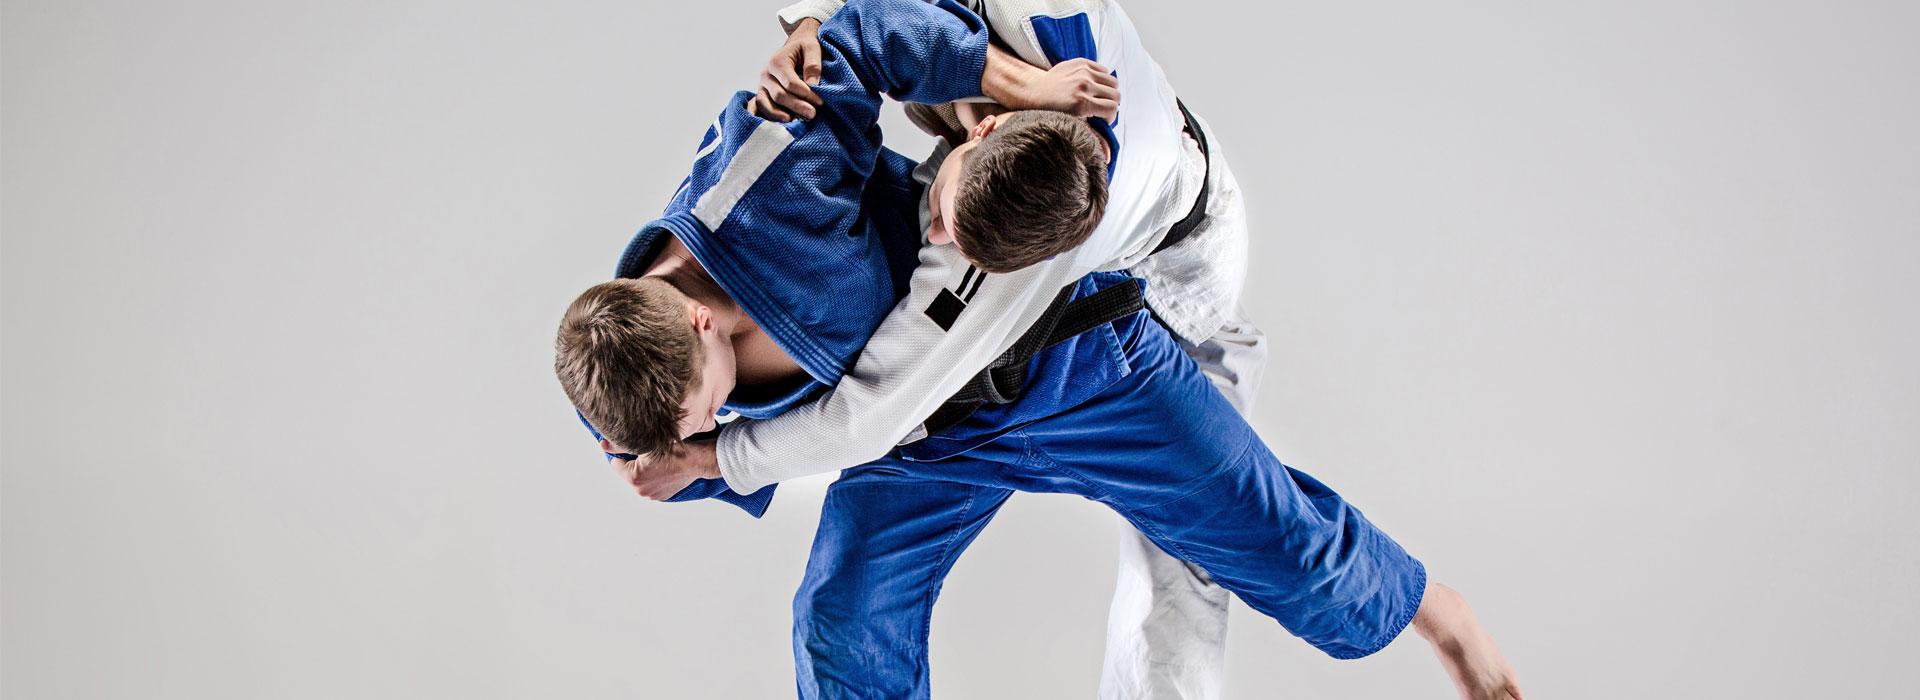 judopak kopen waar moet je op letten